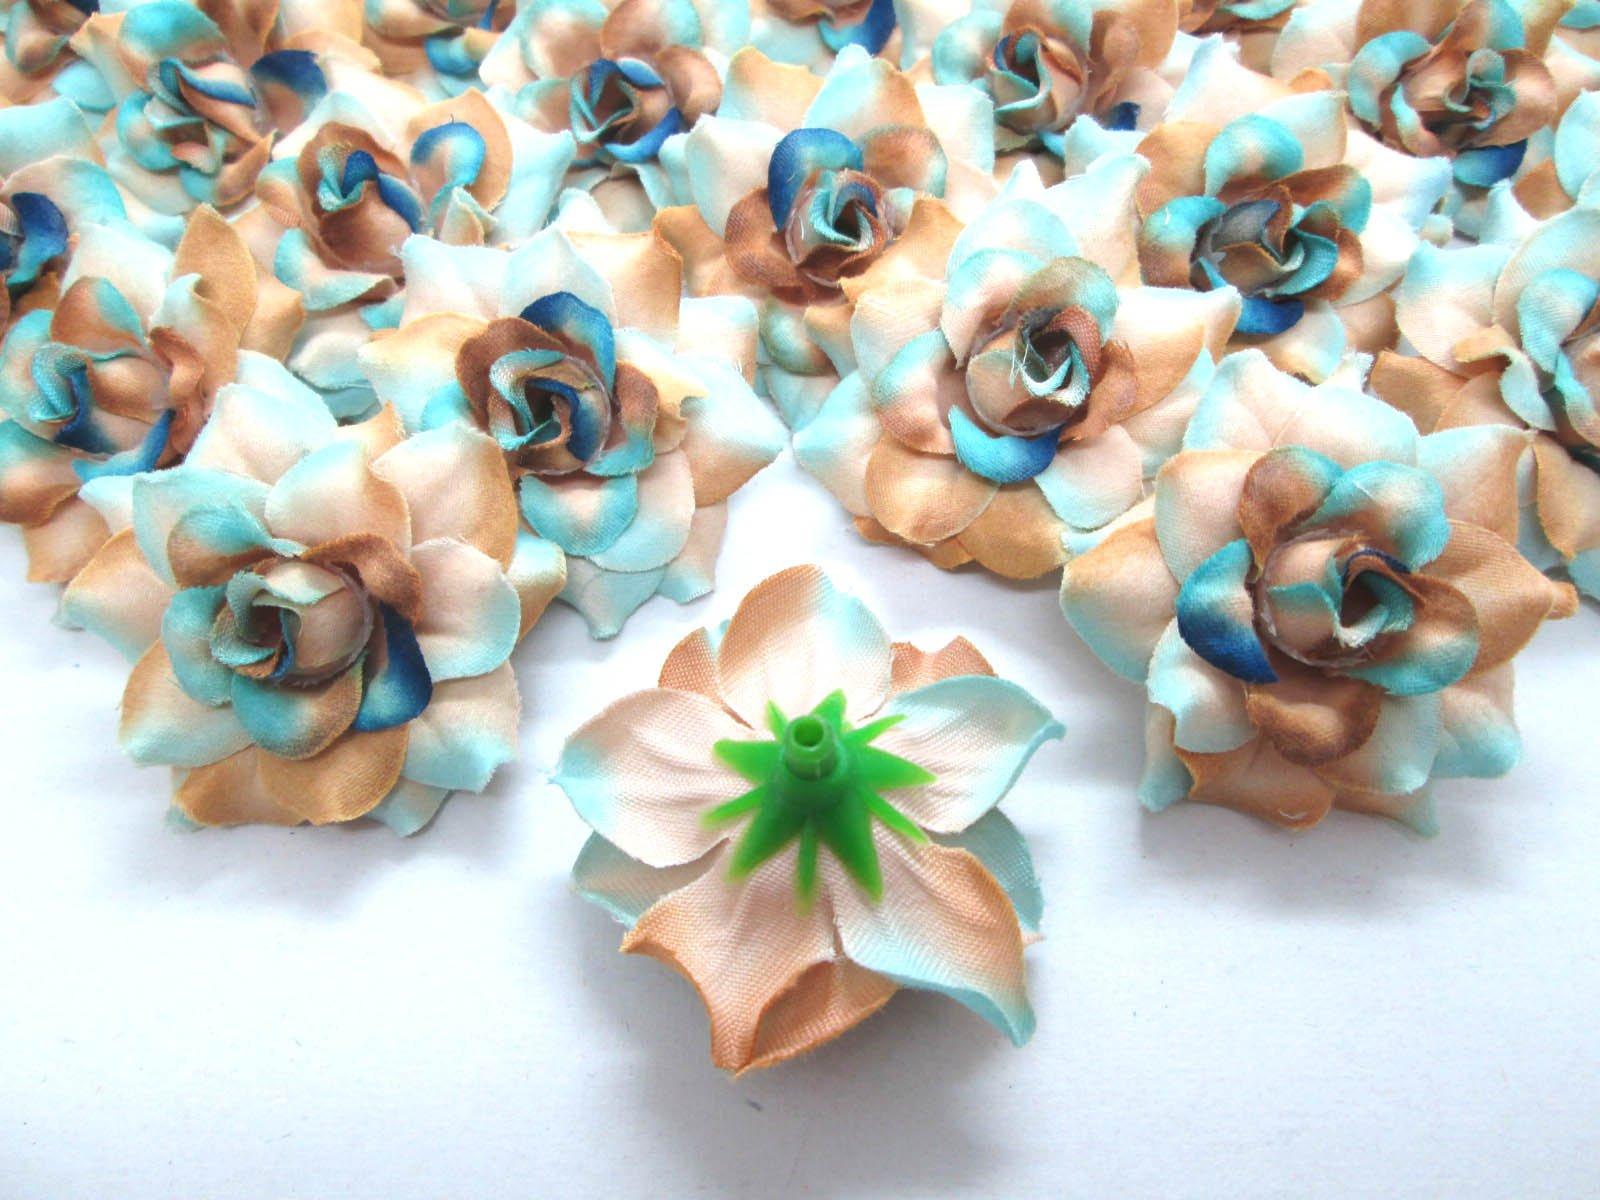 100-Silk-Sea-Beach-Roses-Flower-Head-175-Artificial-Flowers-Heads-Fabric-Floral-Supplies-Wholesale-Lot-for-Wedding-Flowers-Accessories-Make-Bridal-Hair-Clips-Headbands-Dress